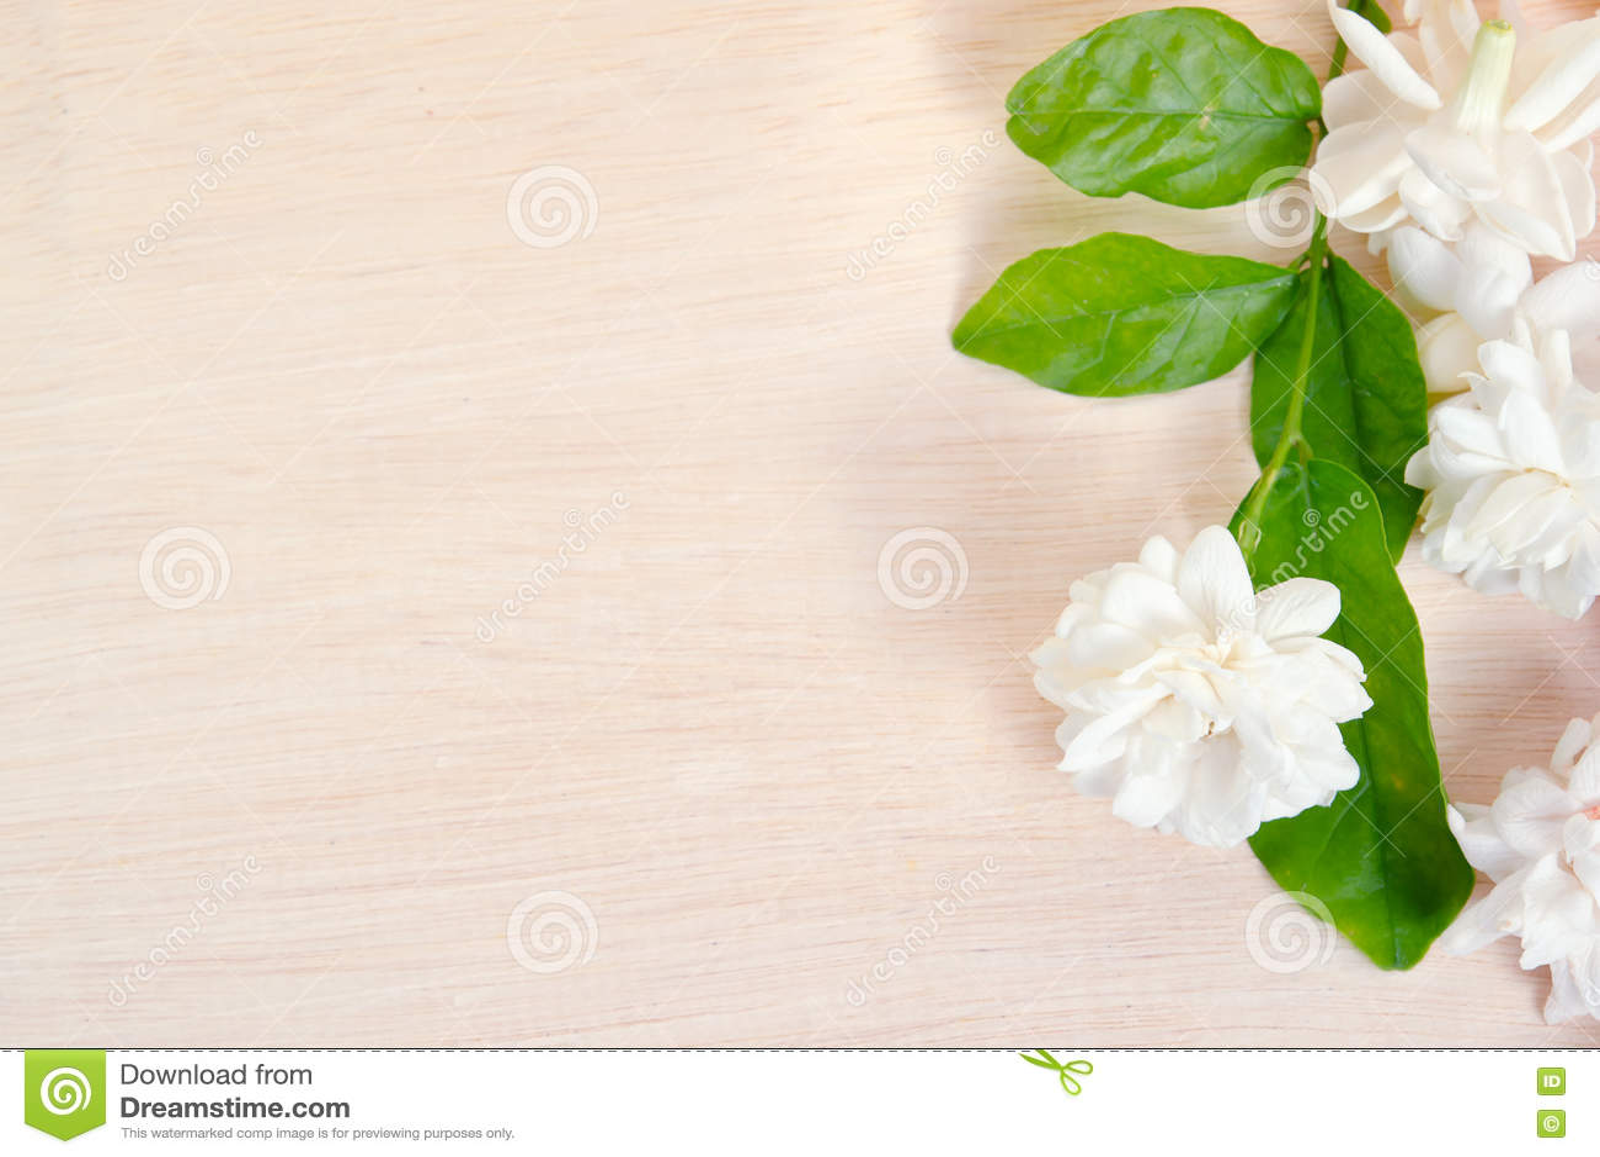 Jasmine flowers spread on wooden board background stock image jasmine flowers spread on wooden board background izmirmasajfo Gallery